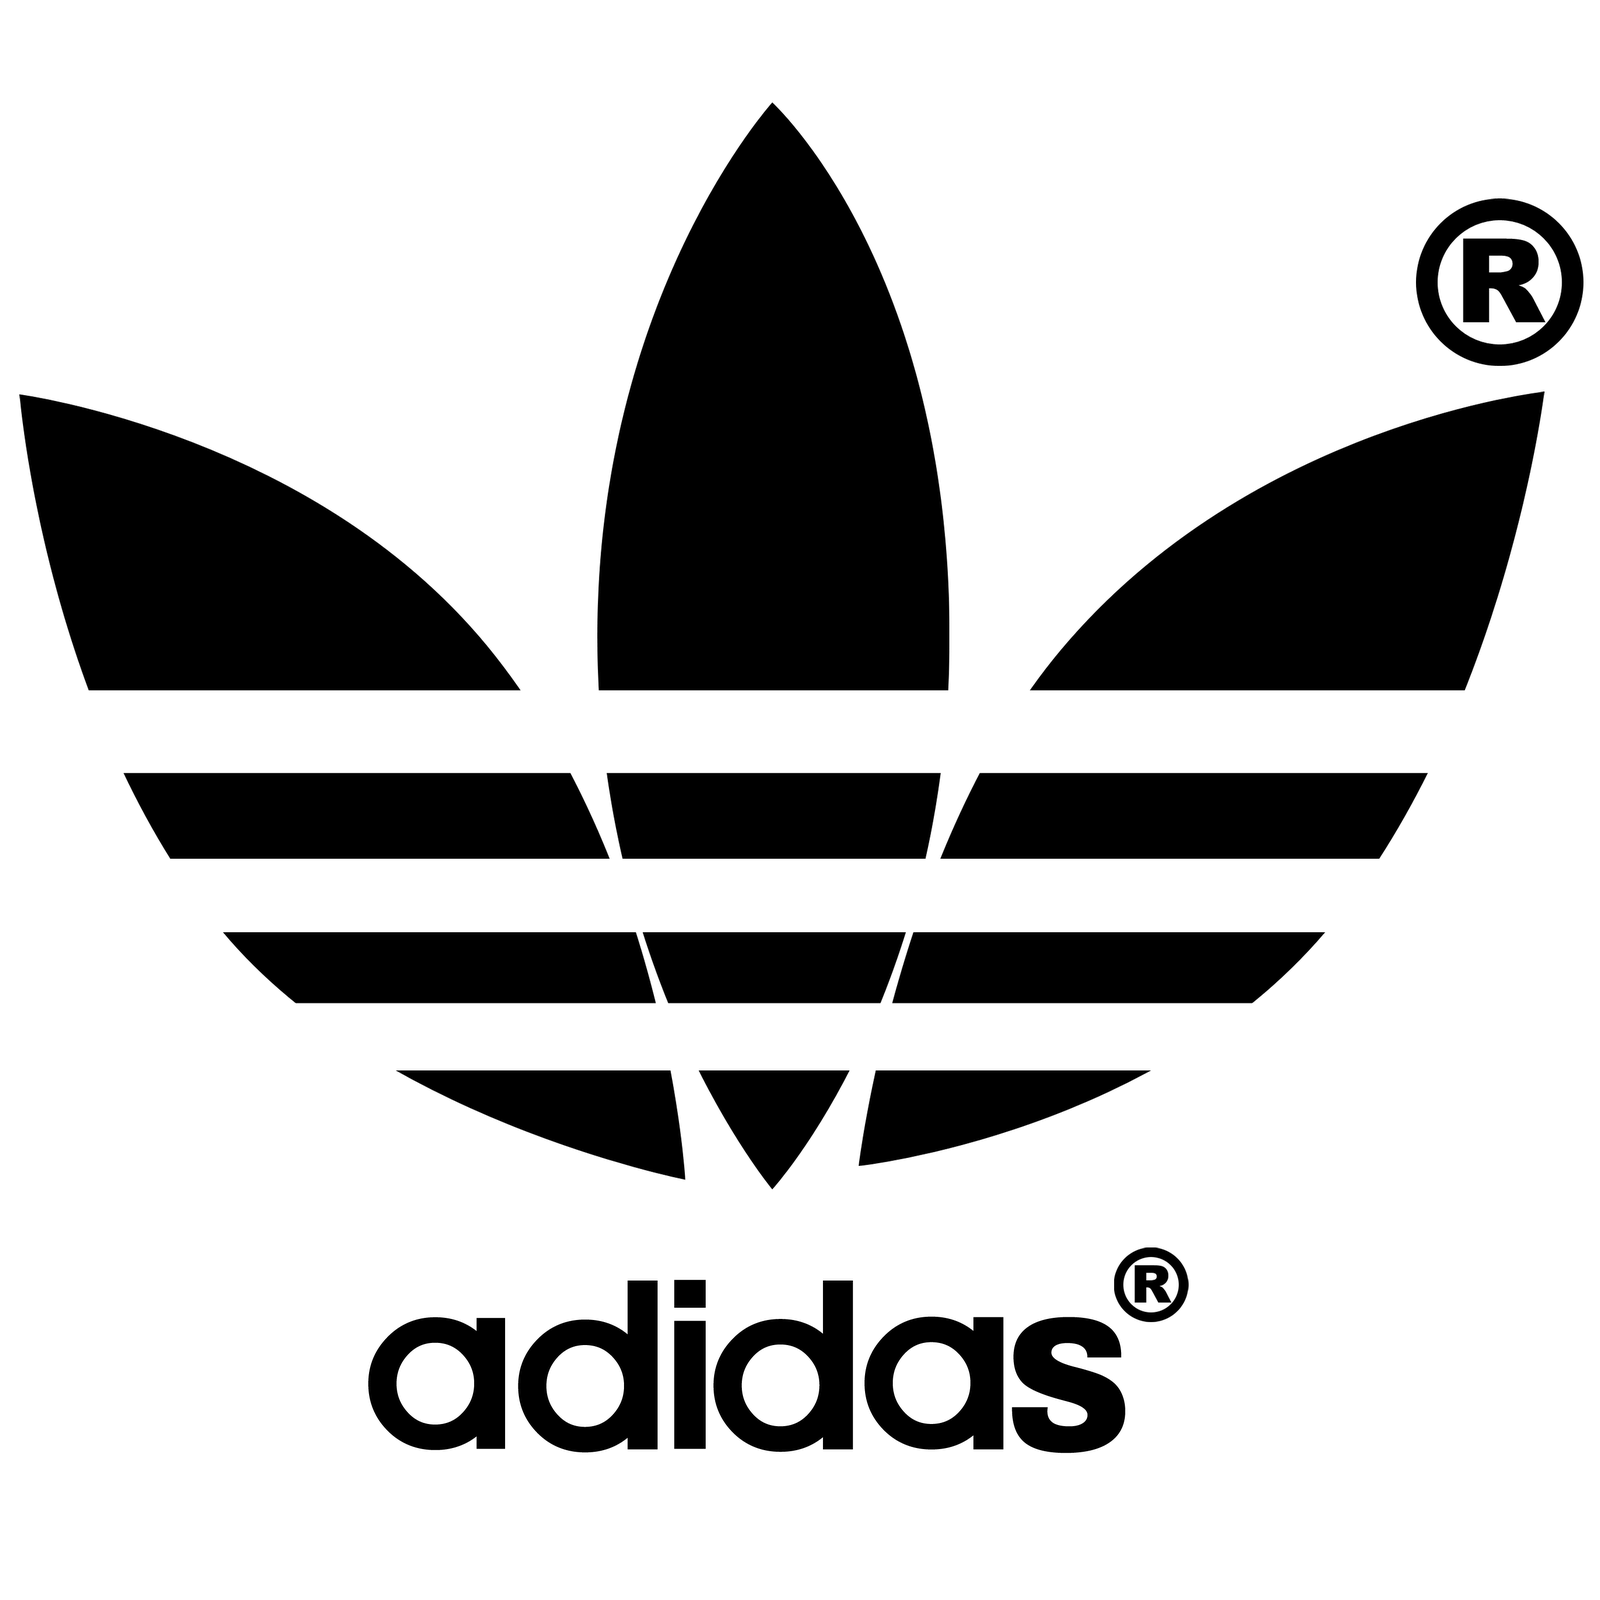 logos gallery picture adidas logo